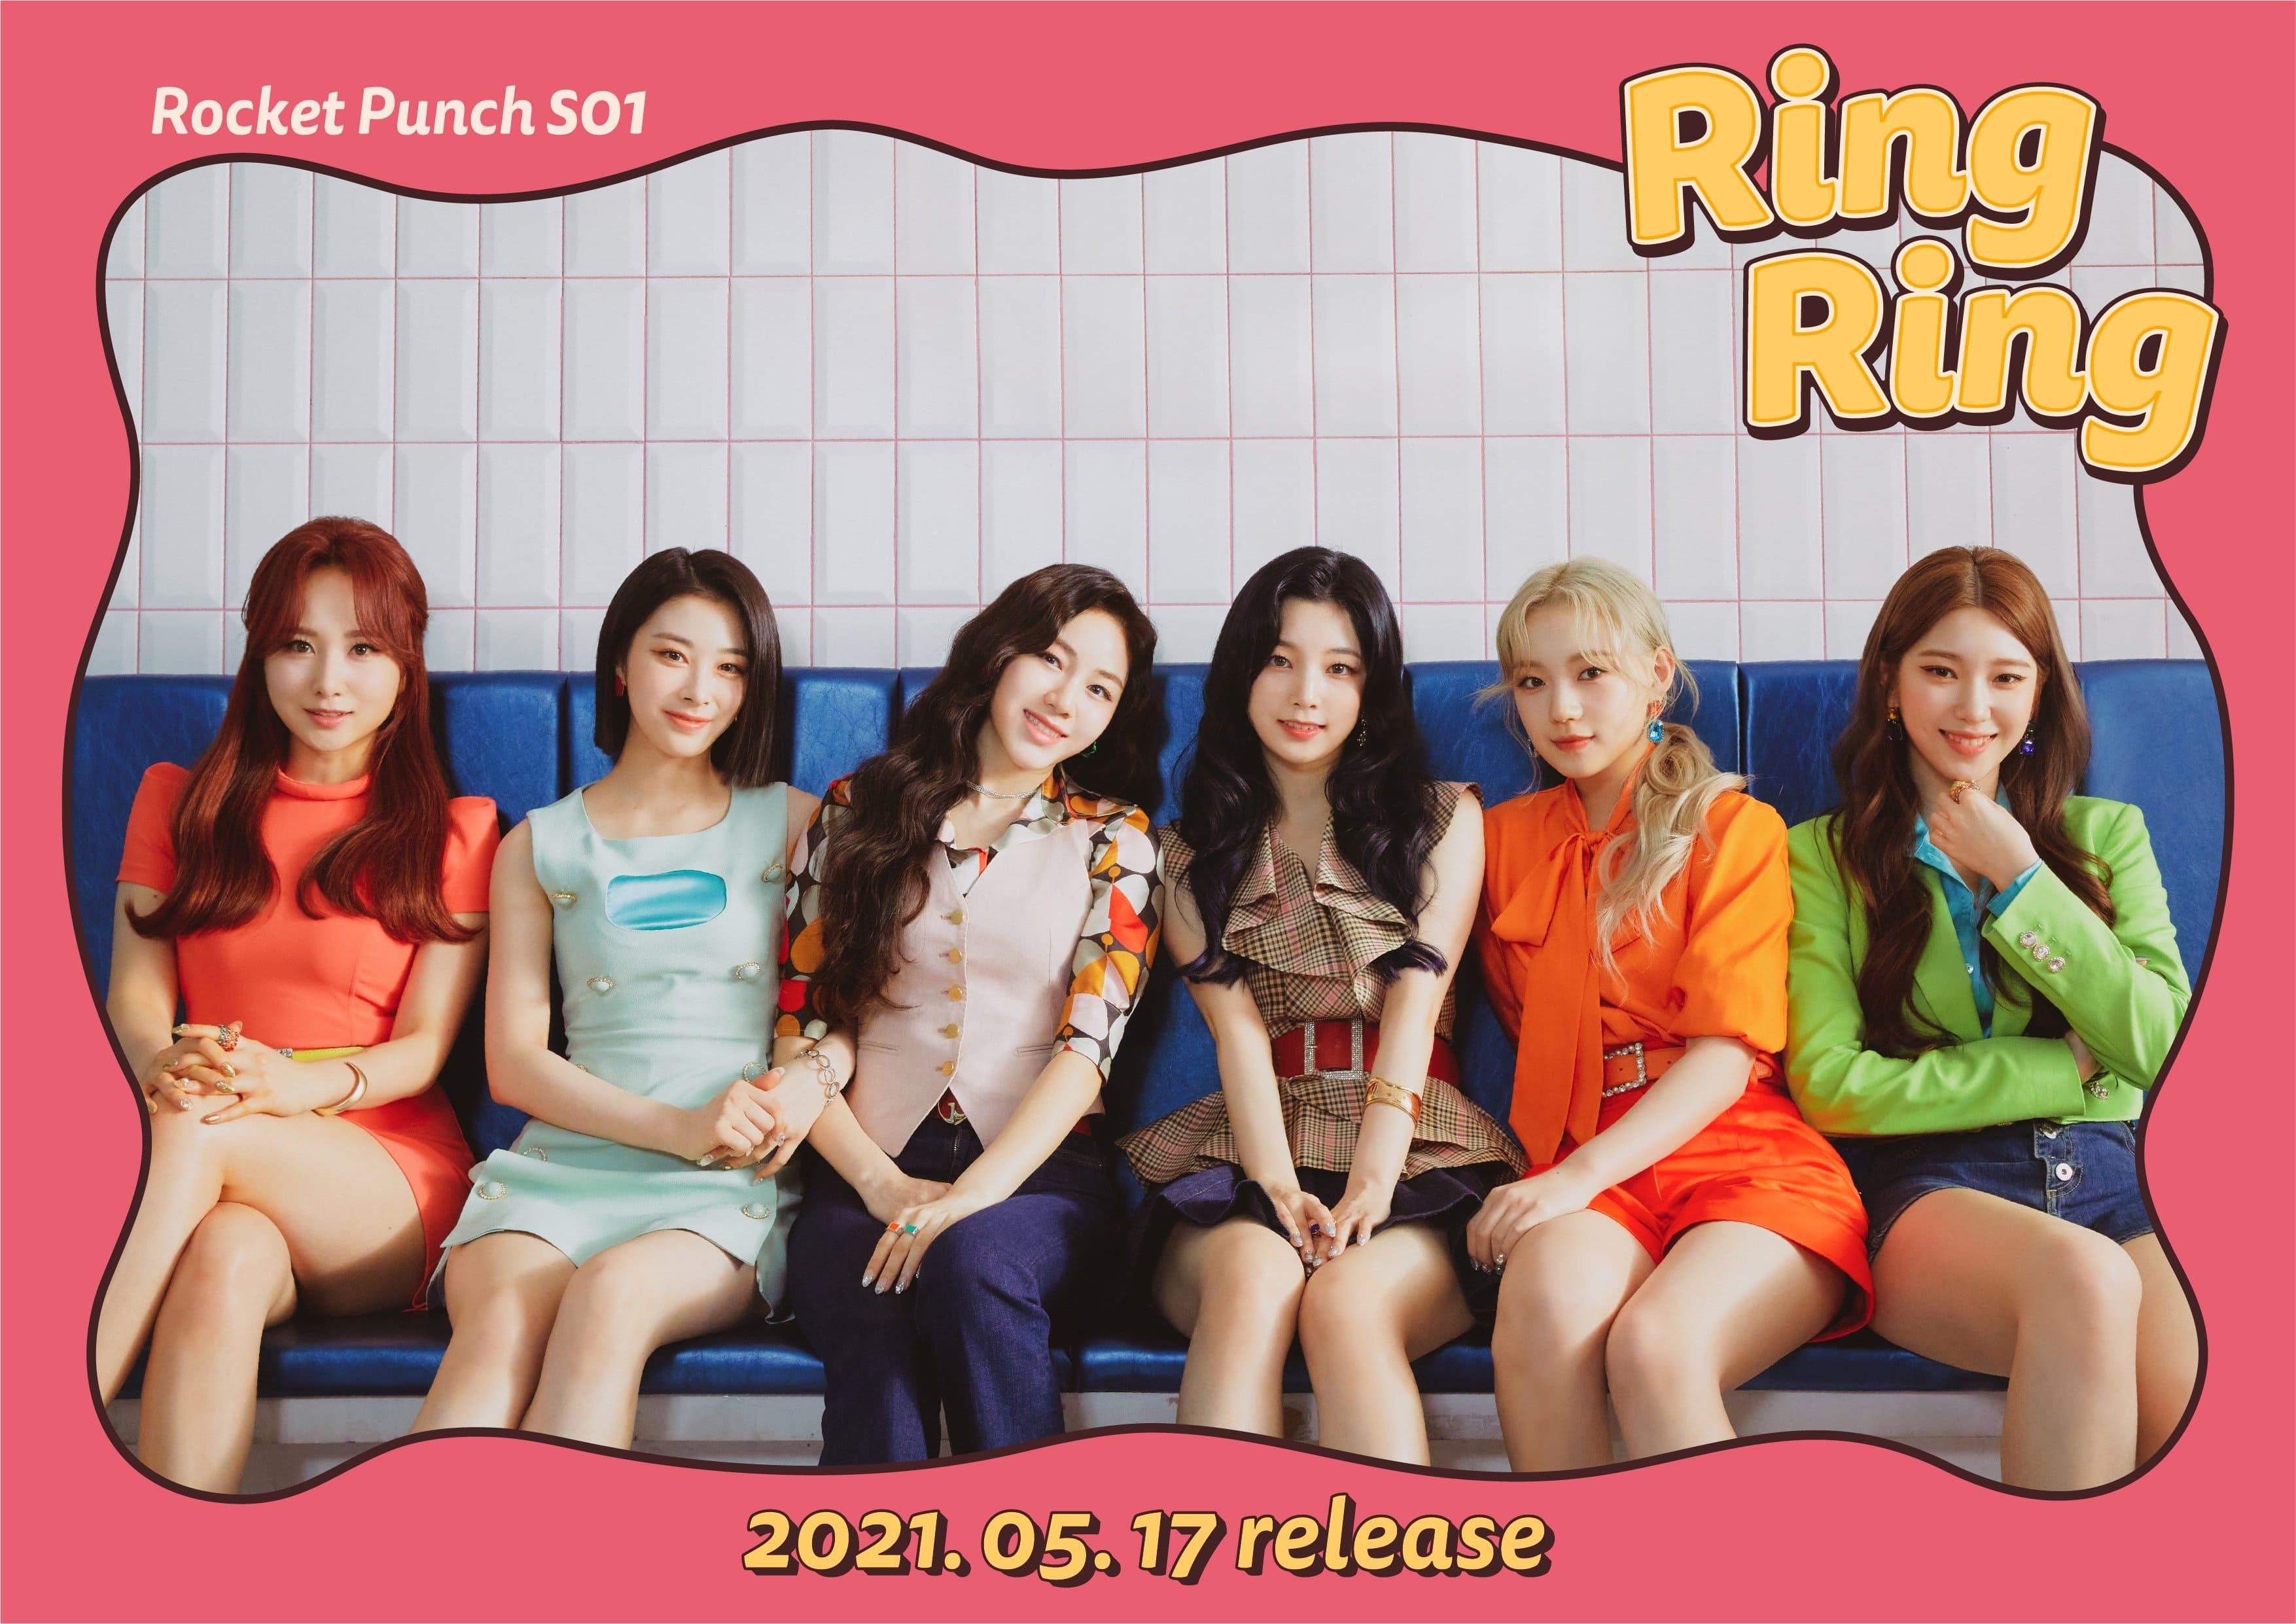 rocket punch1